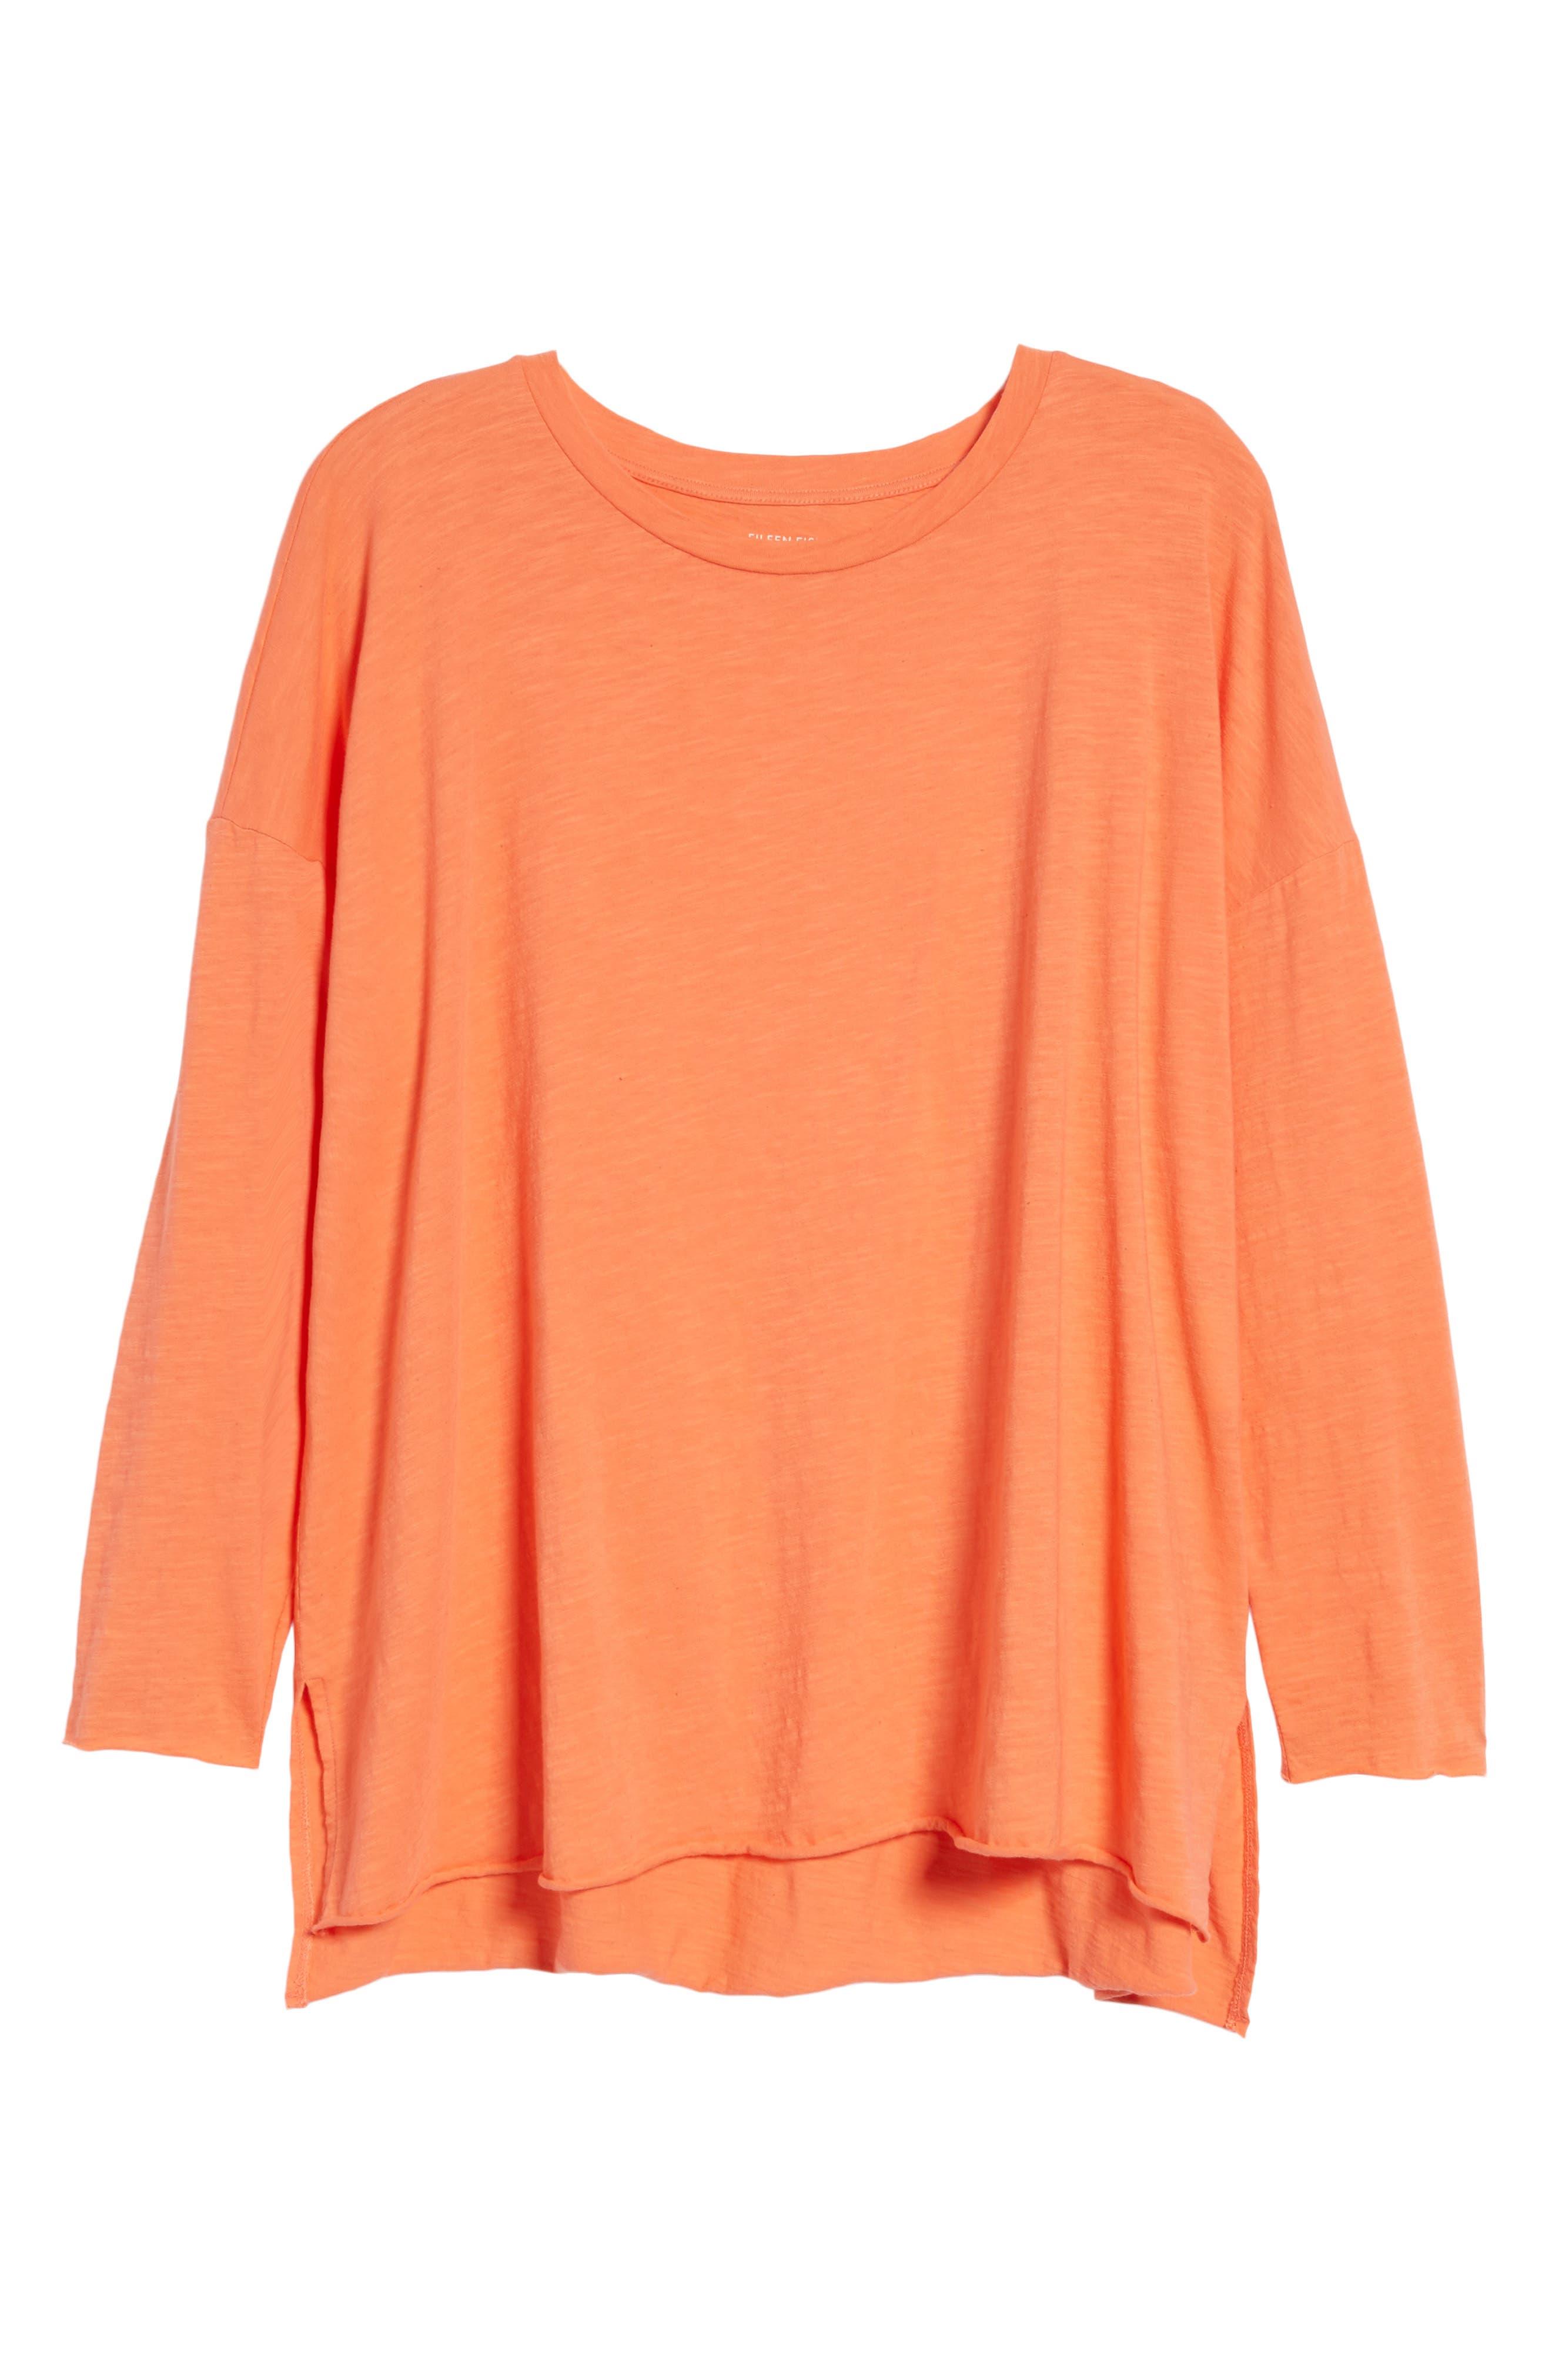 Organic Cotton Knit Top,                             Alternate thumbnail 54, color,